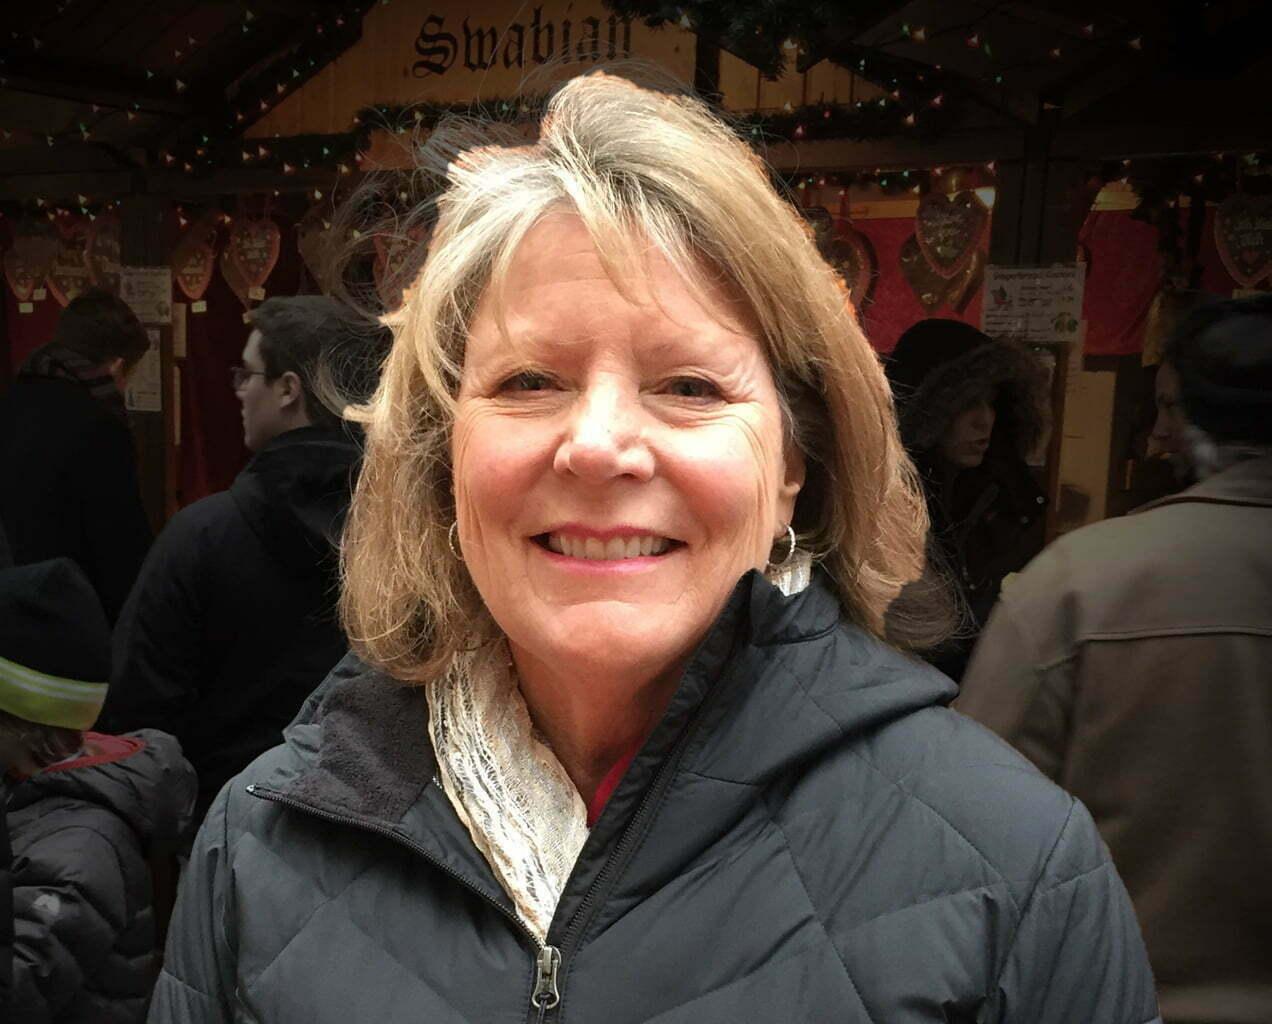 Elaine M. Delves